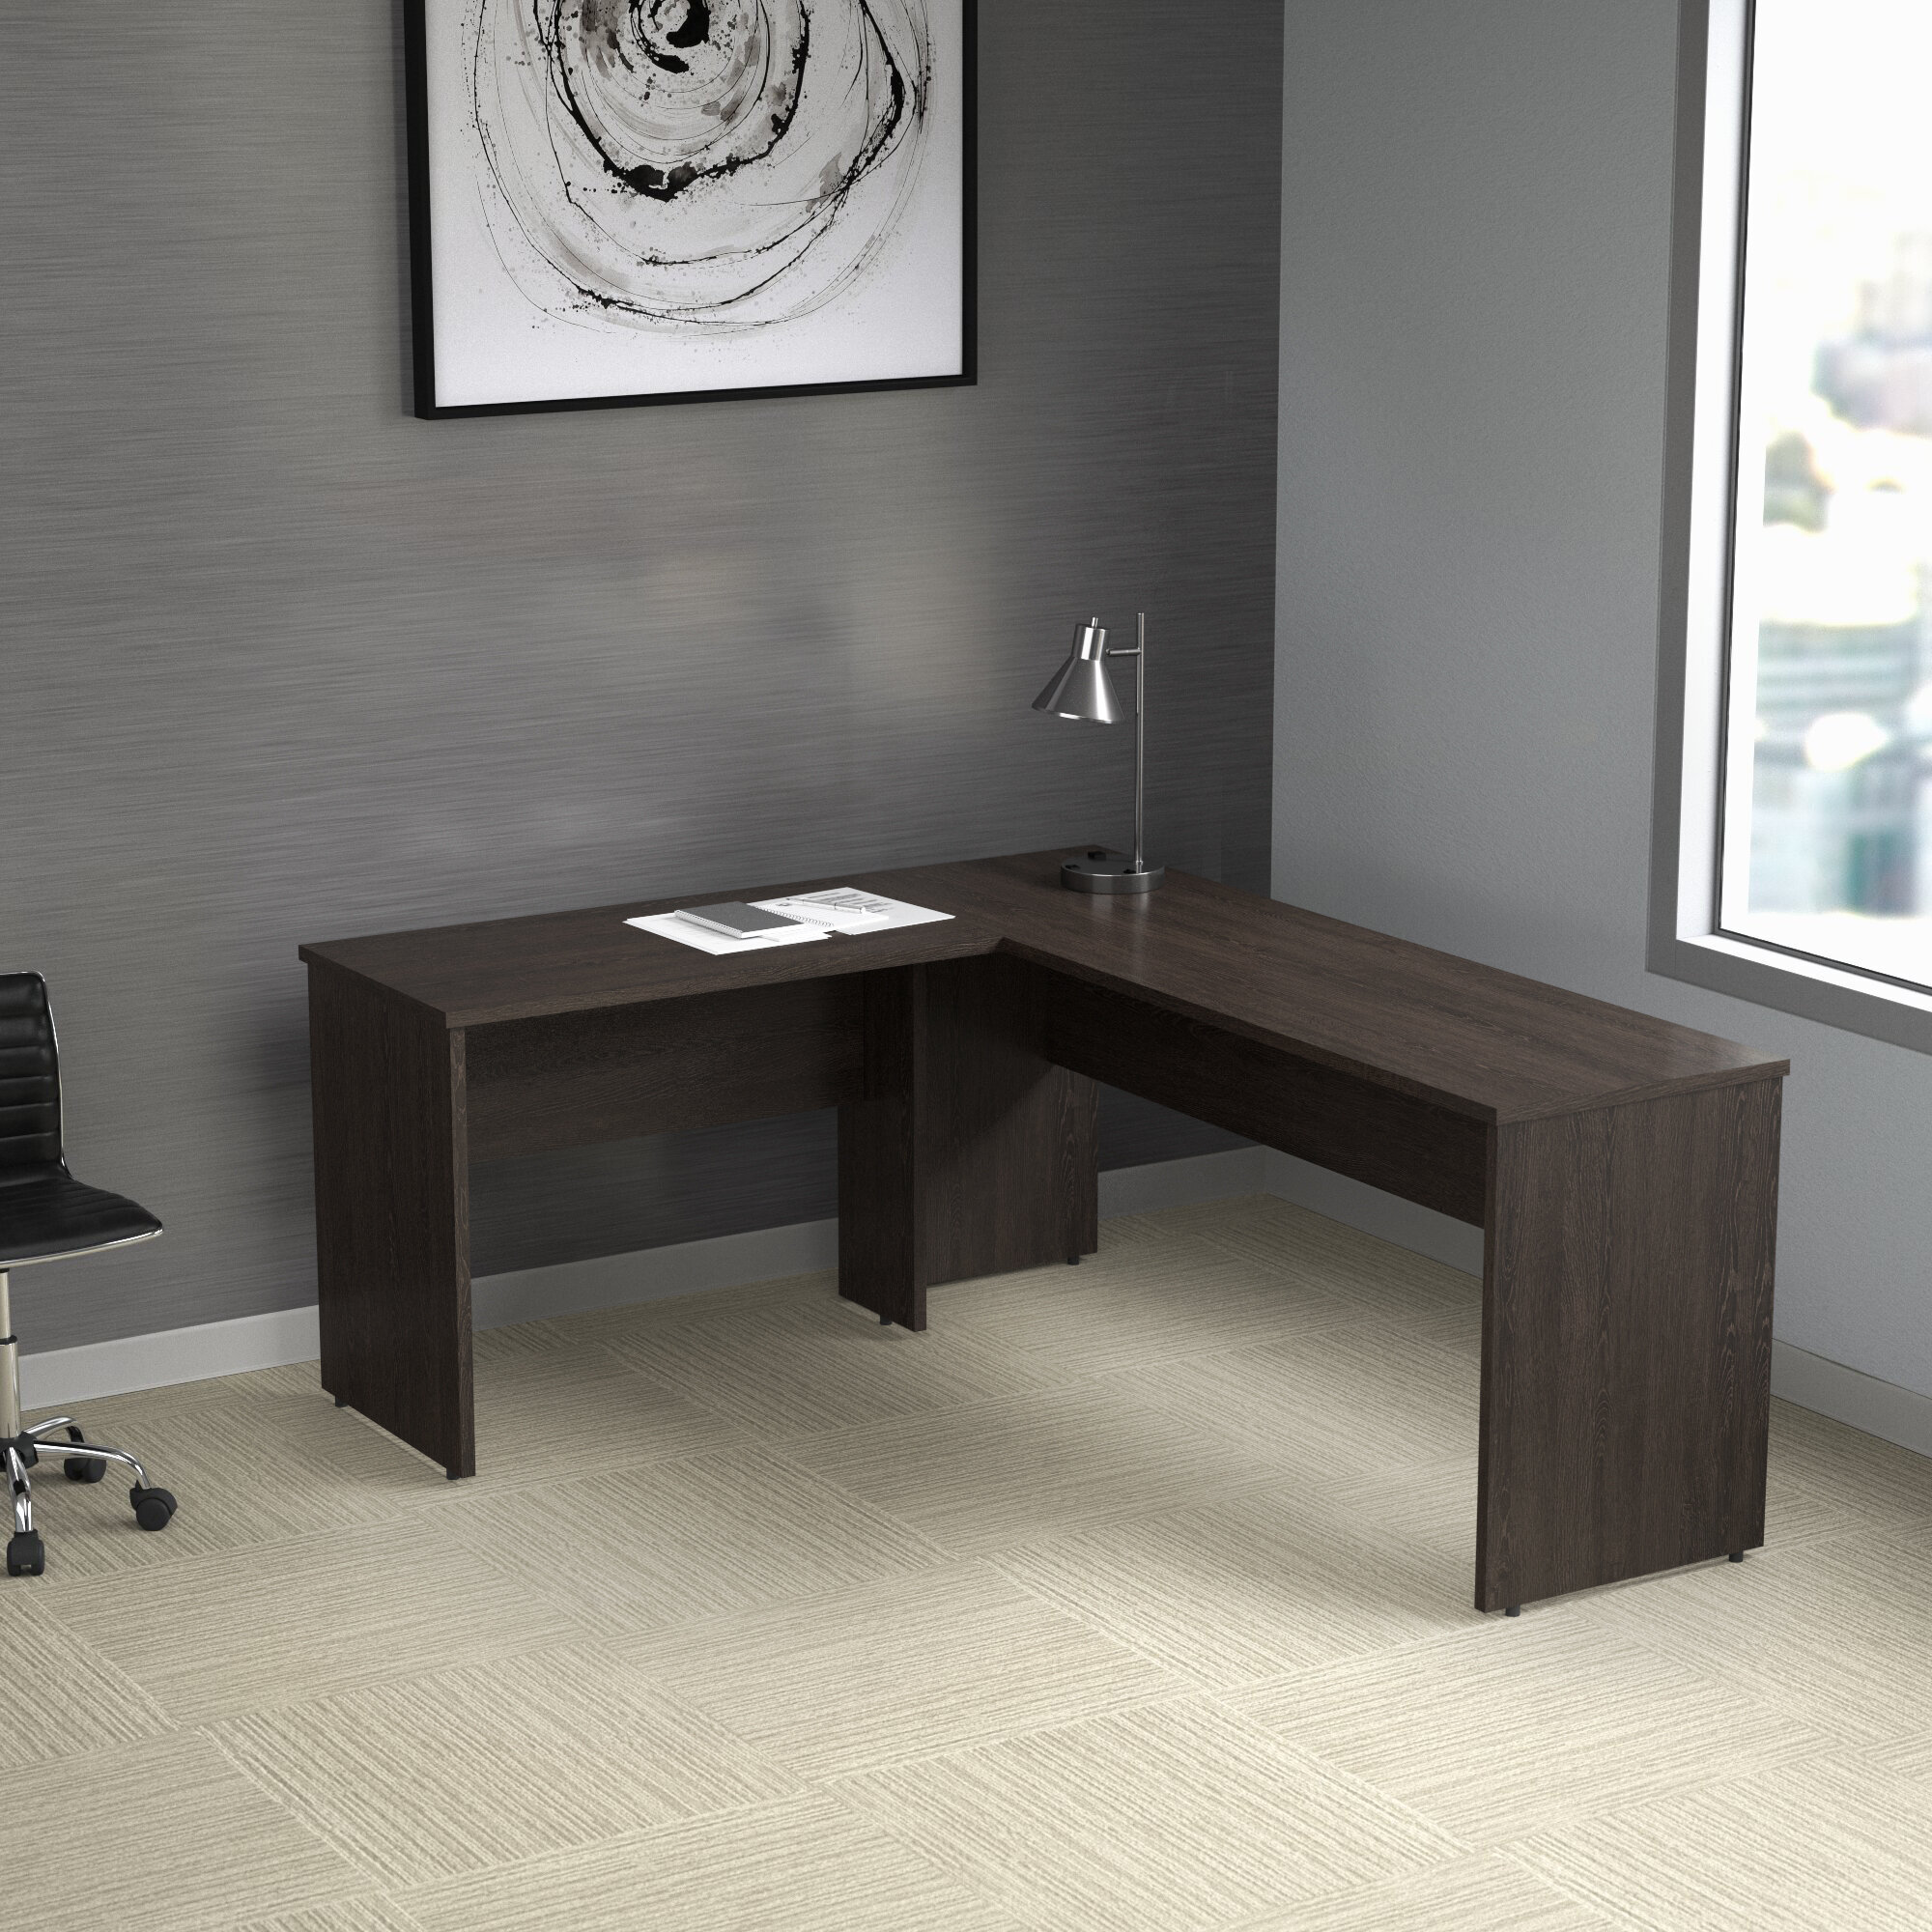 Espresso Wood Executive Desks You Ll Love In 2021 Wayfair